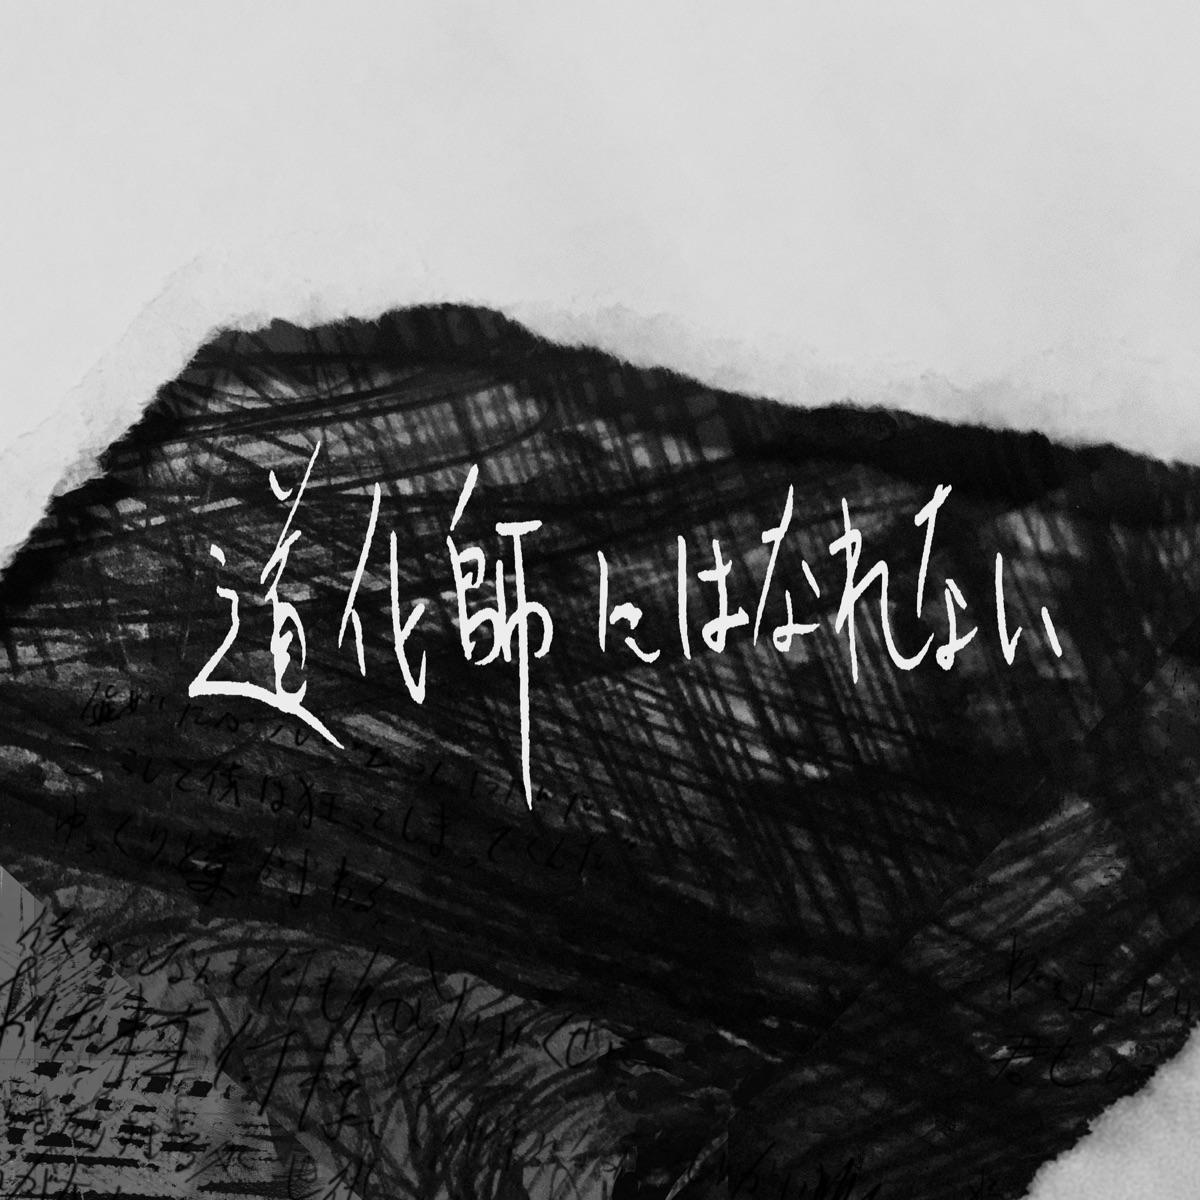 『Hakubi - 道化師にはなれない』収録の『道化師にはなれない』ジャケット